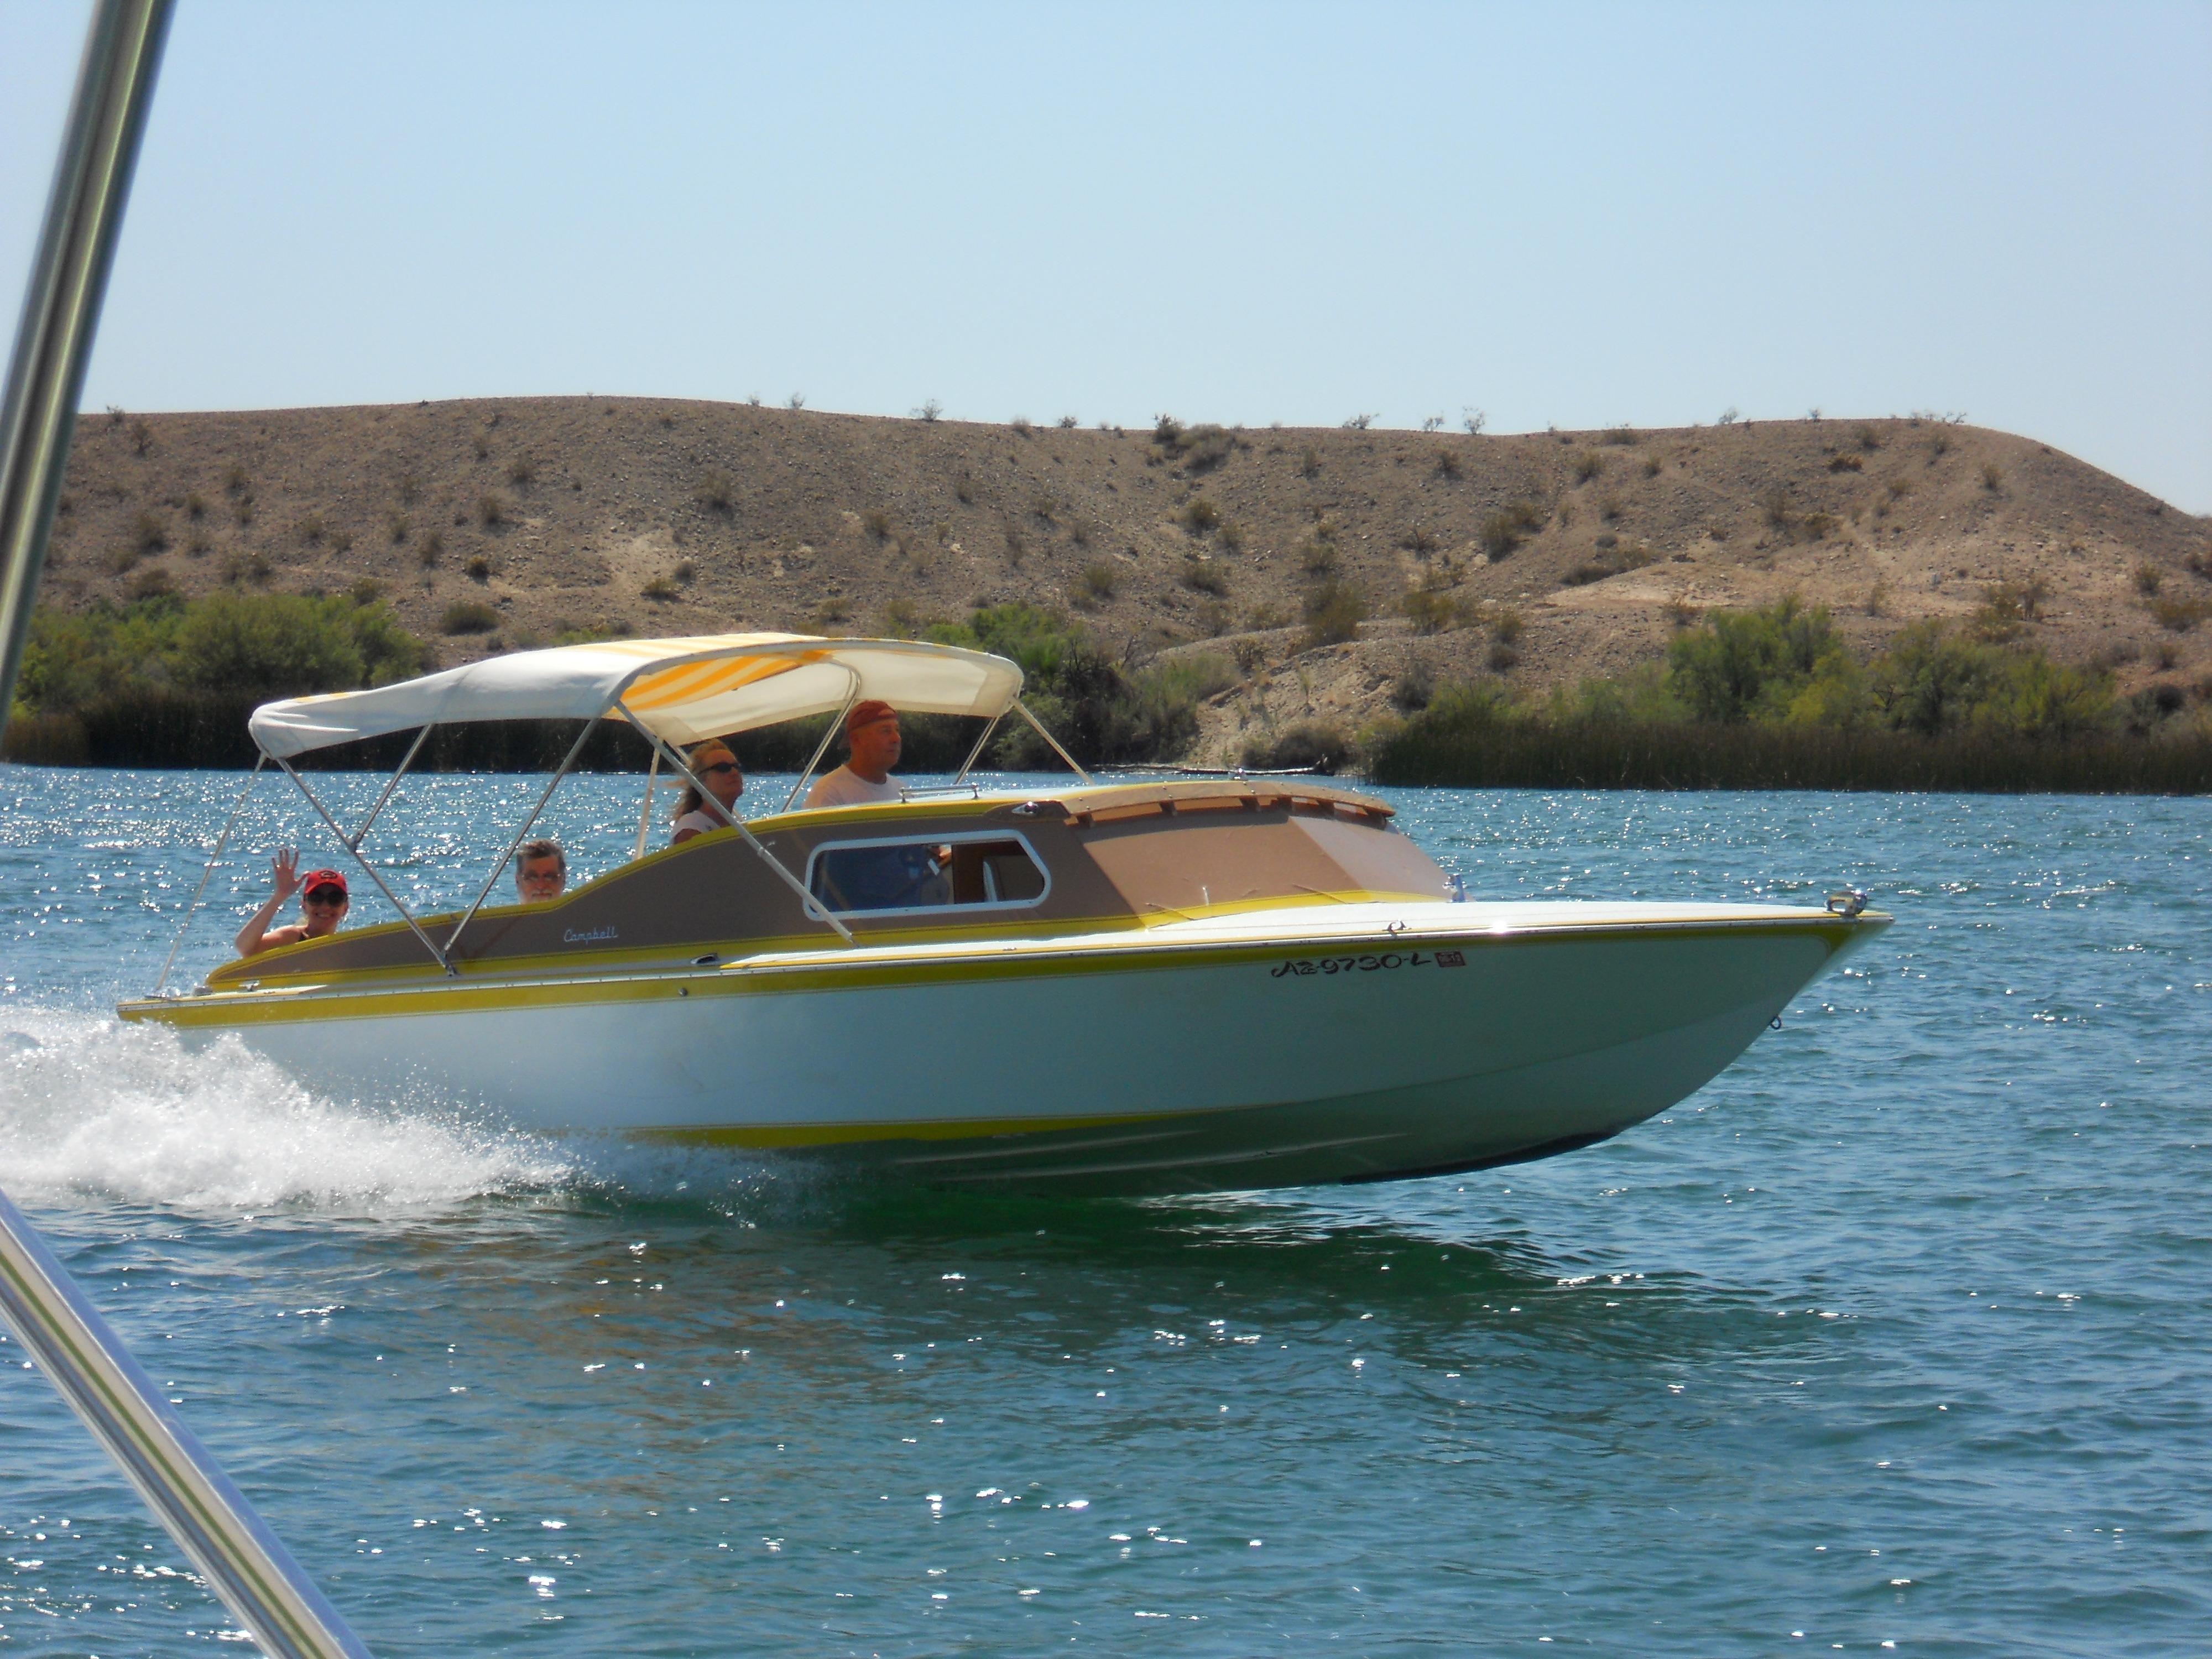 tourboat devea service feadship dsc cabin boat classic cabins cruisers vehicle cruiser